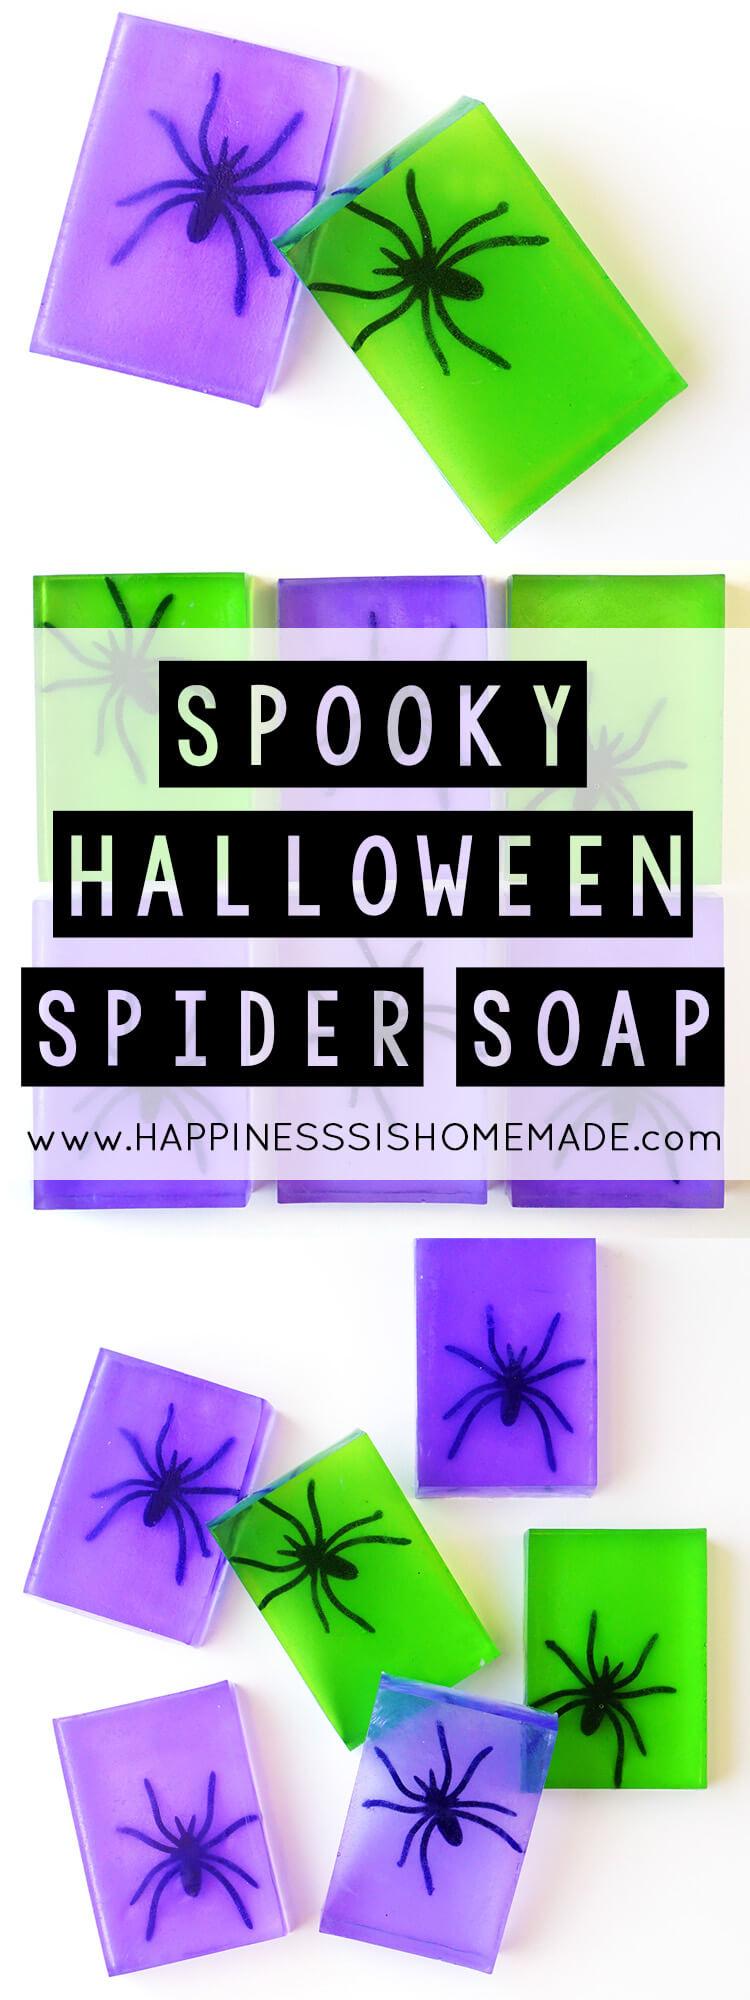 Spooky Spider Soap Hallowen Craft